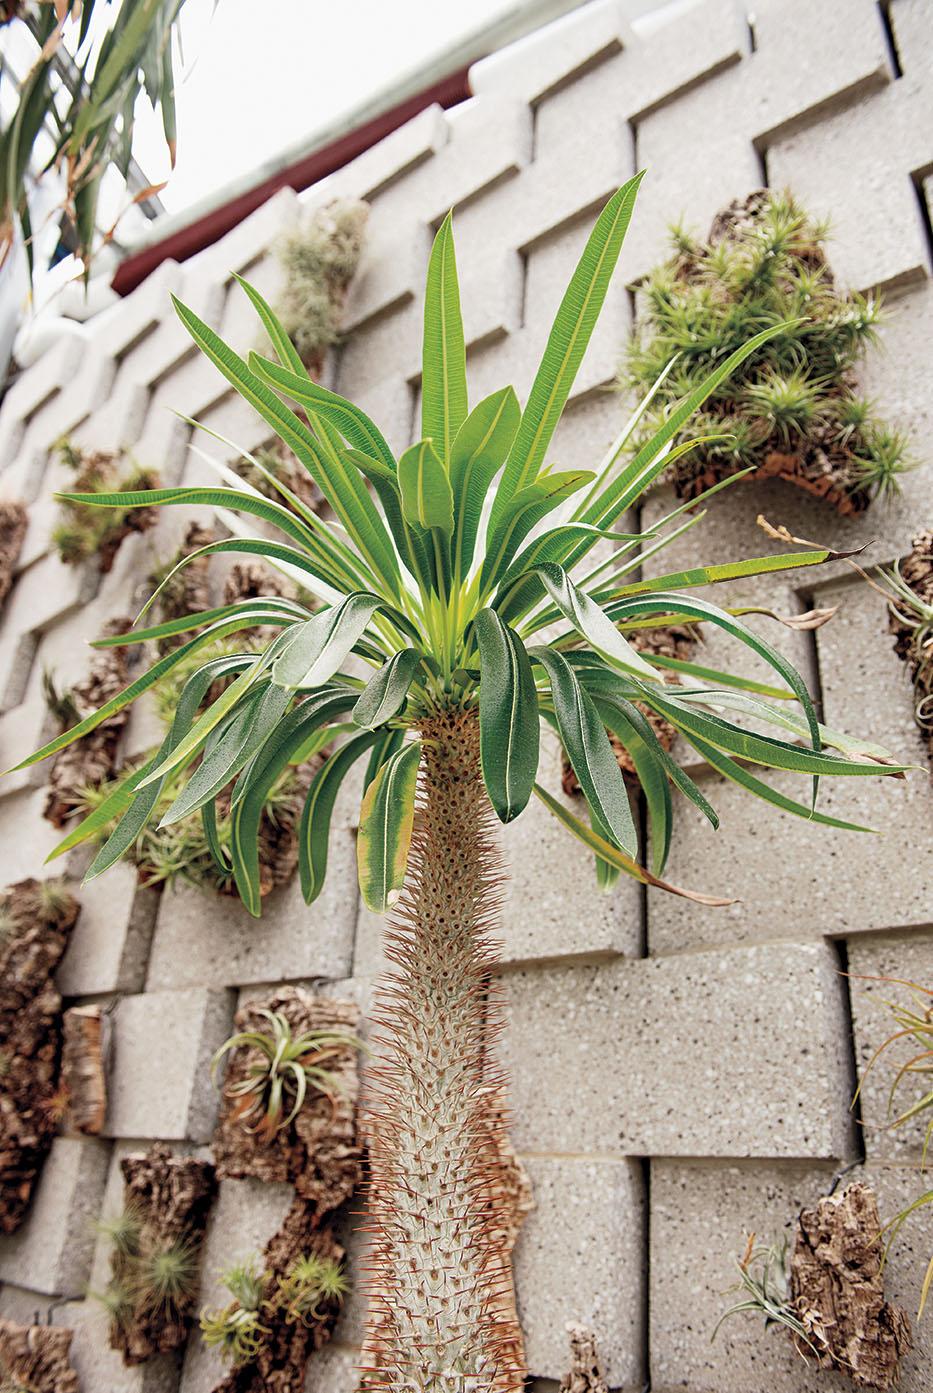 A photo shows a  Vontakabe, a spiny plant native to Madagascar.